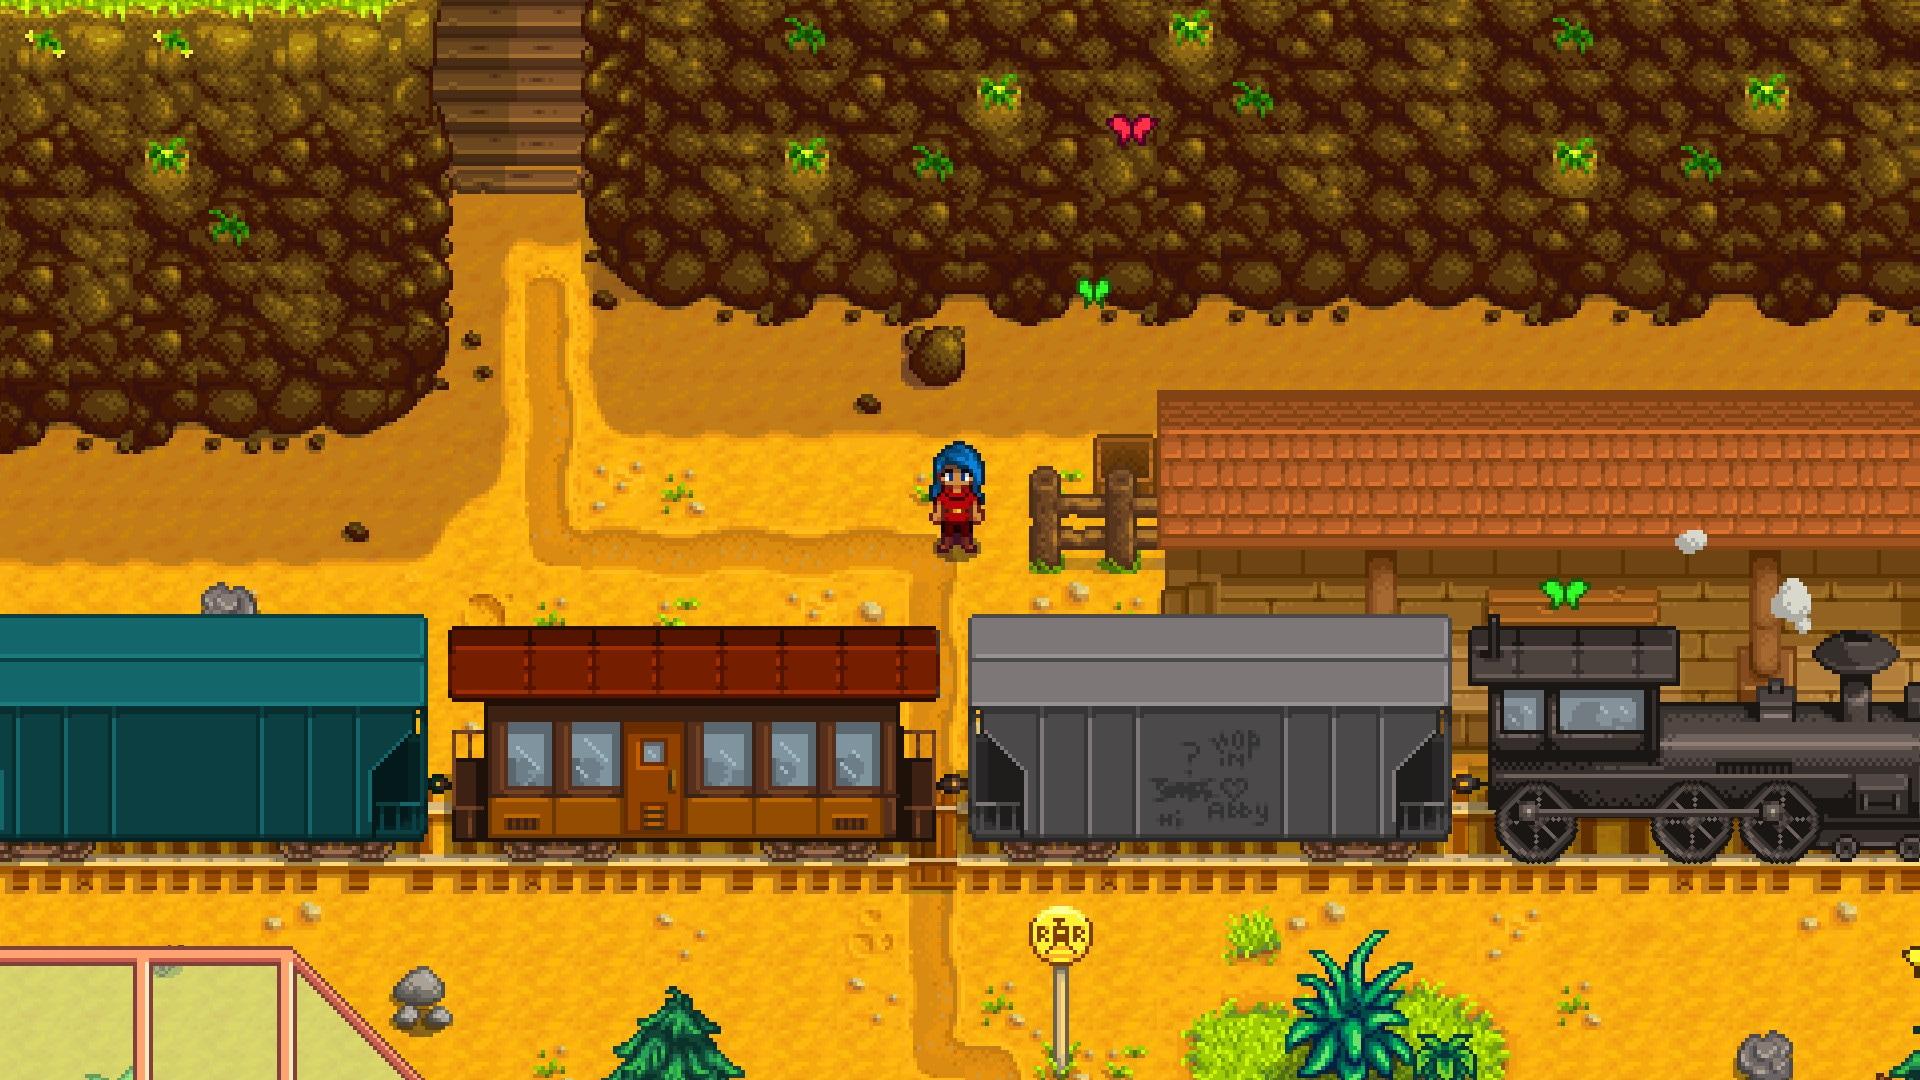 Stardew Valley (PC) - Buy Steam Game CD-Key